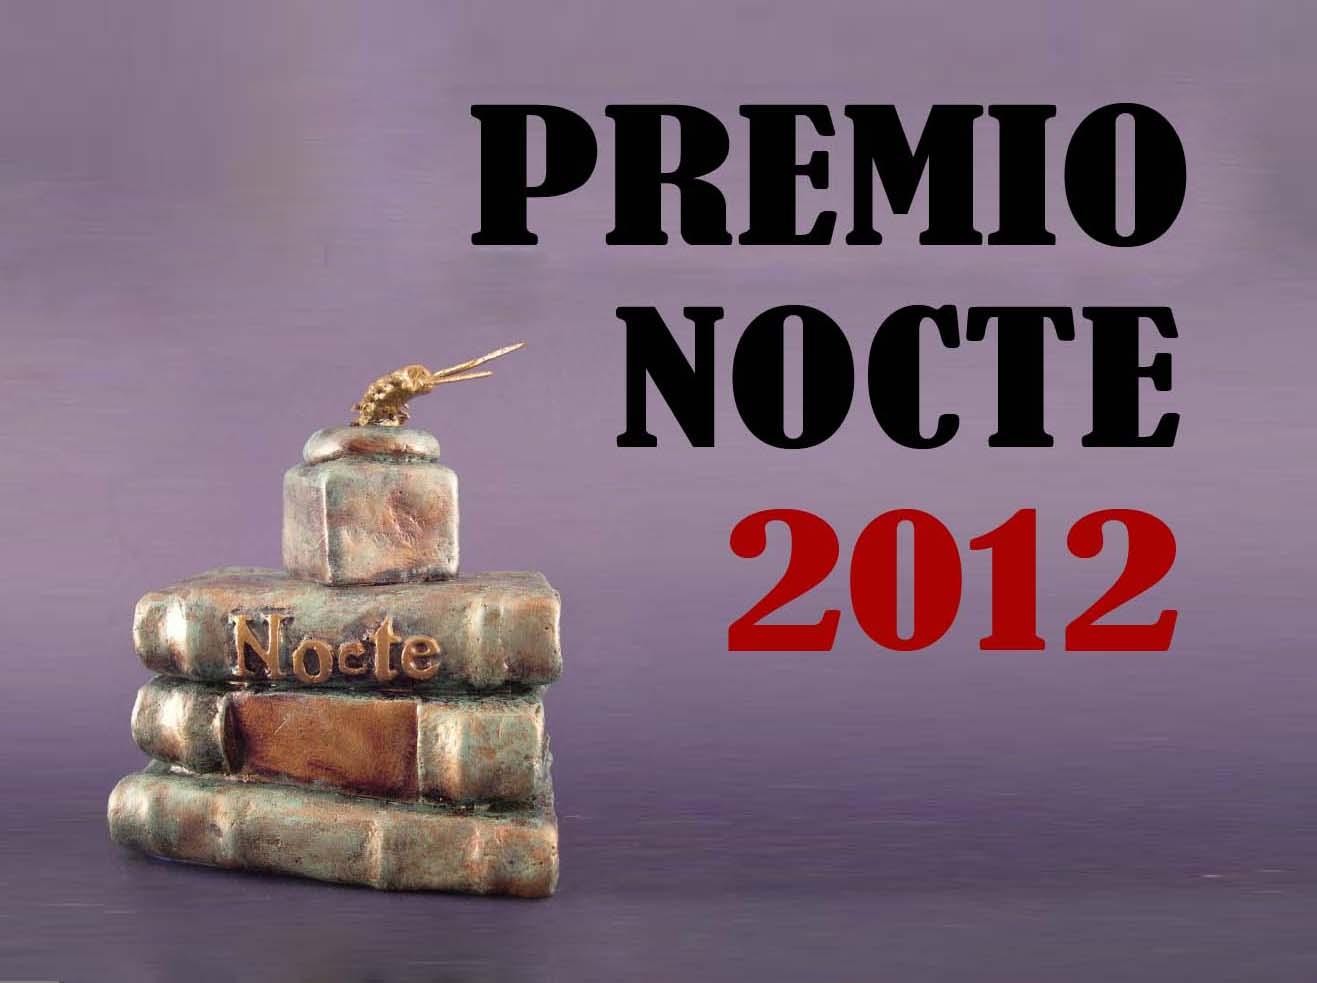 PREMIO AL BLOG DE LA NOCHE 2012!!